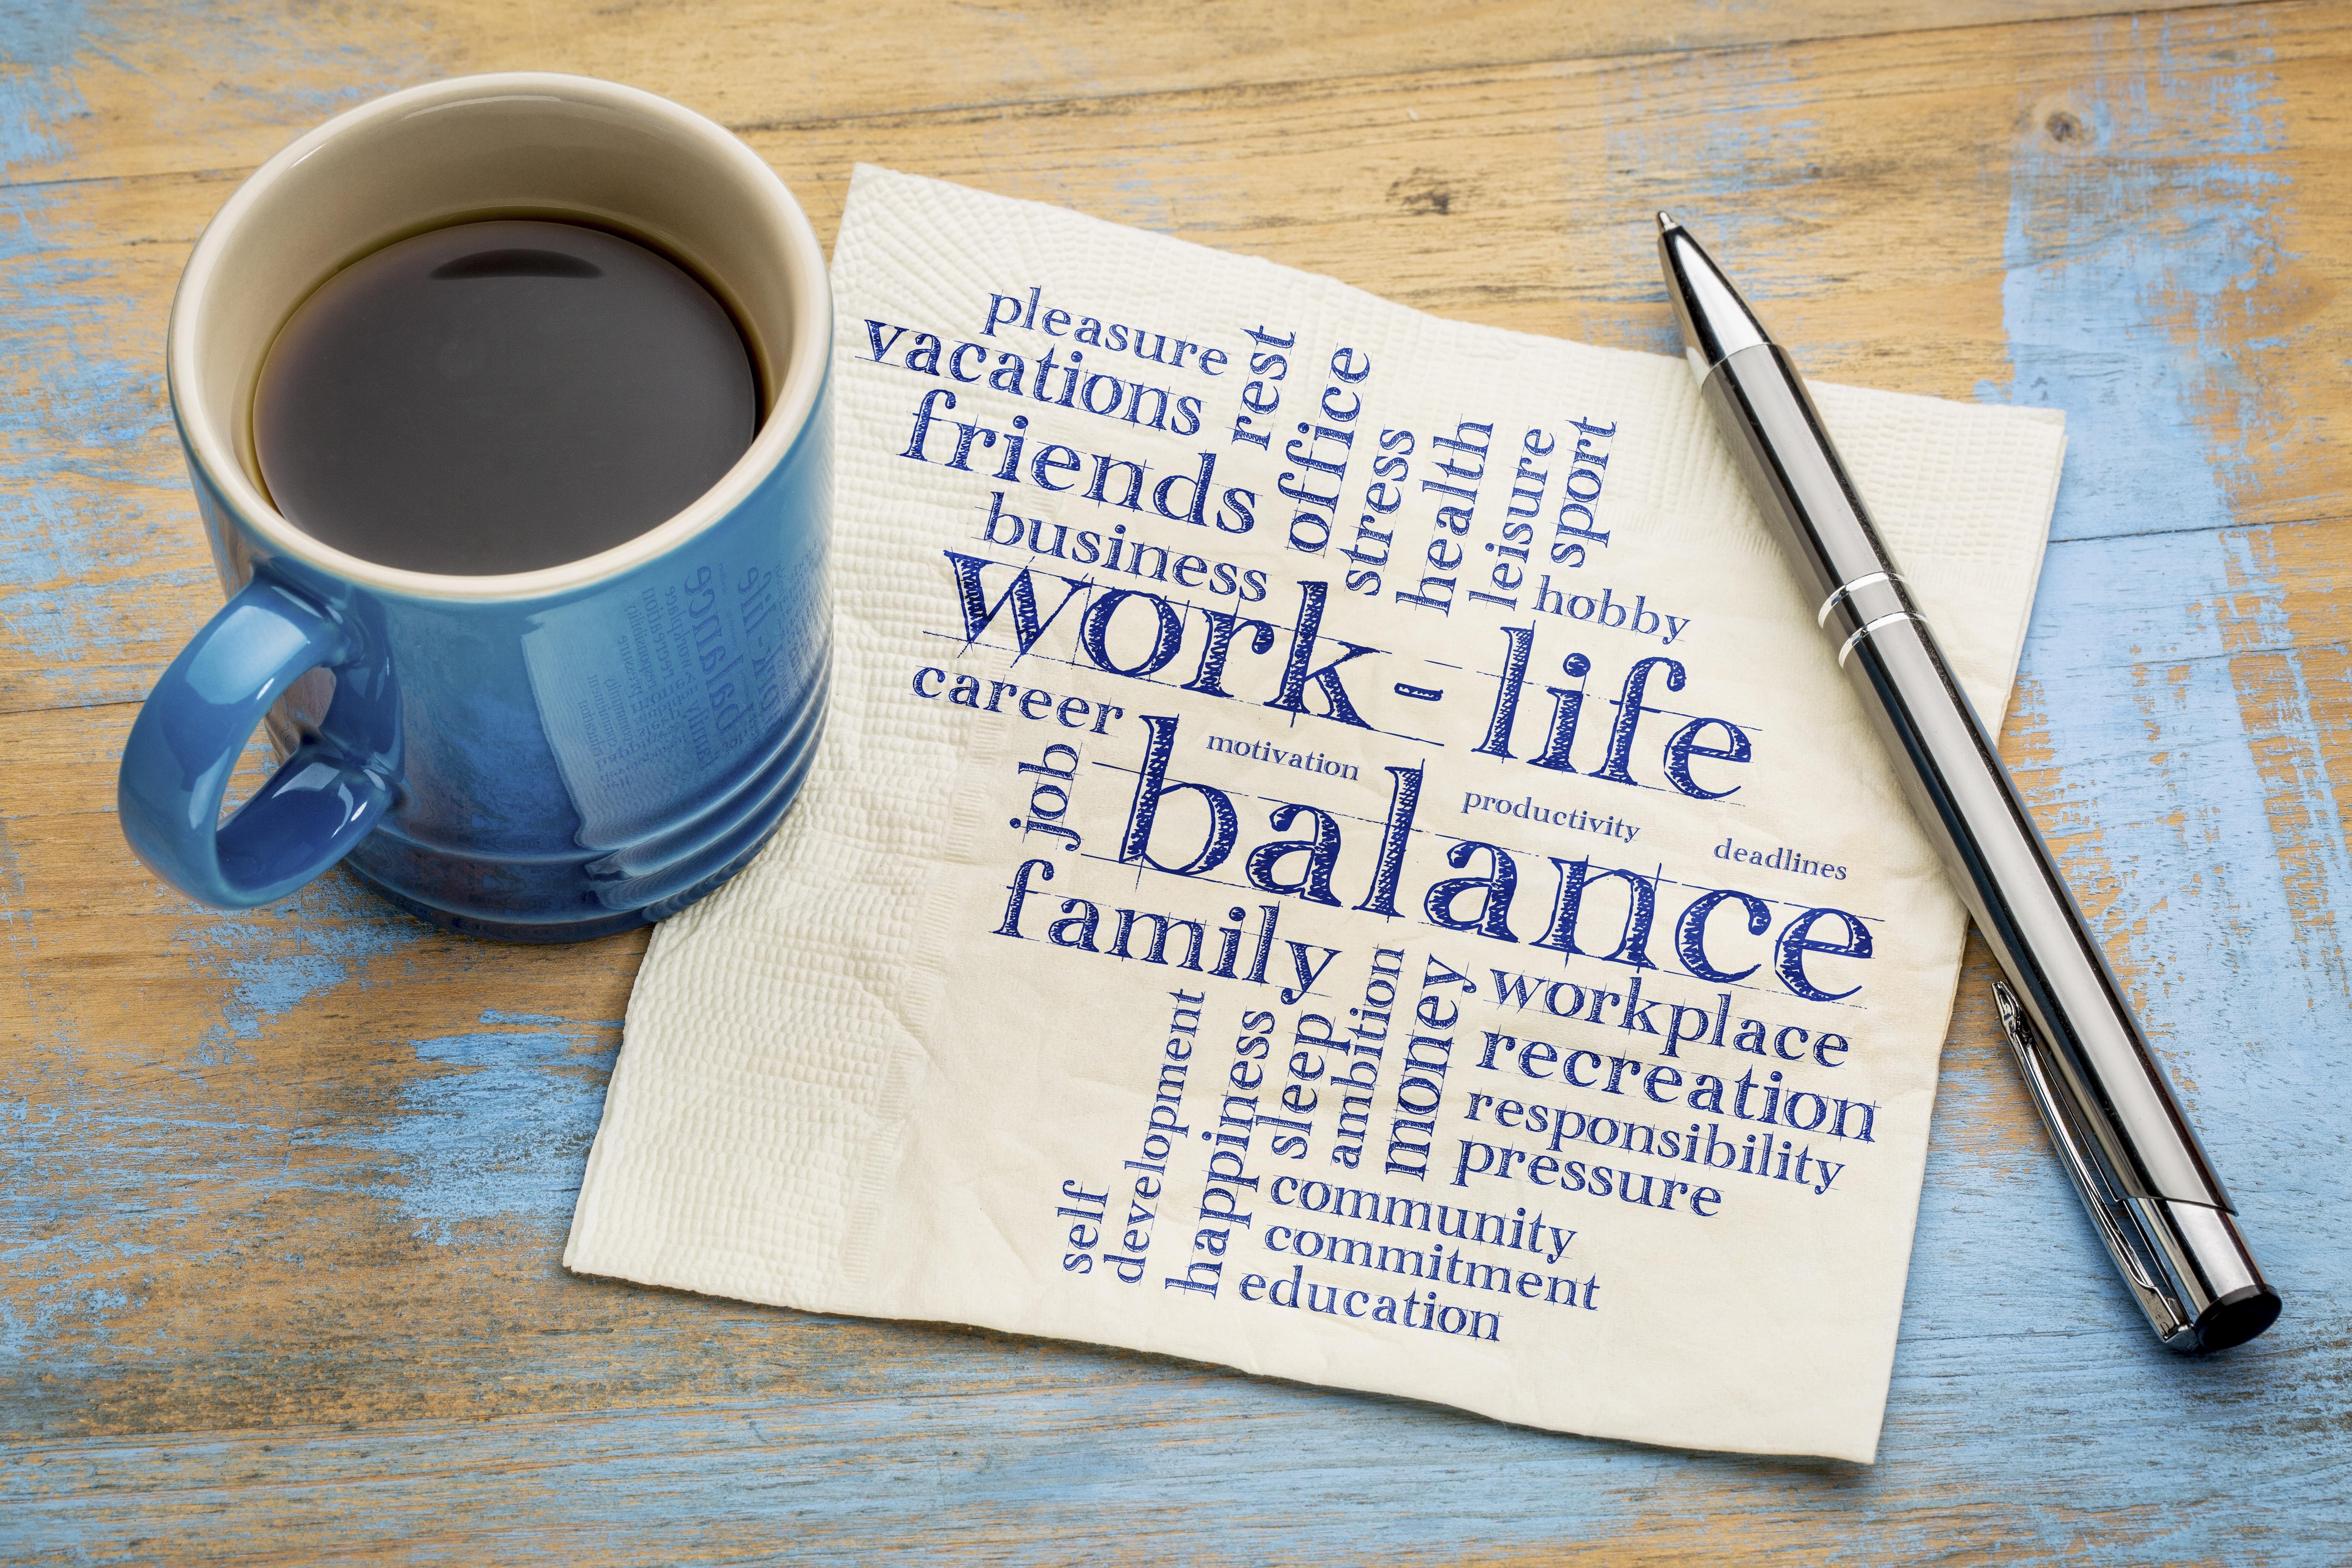 work life balance for first responder